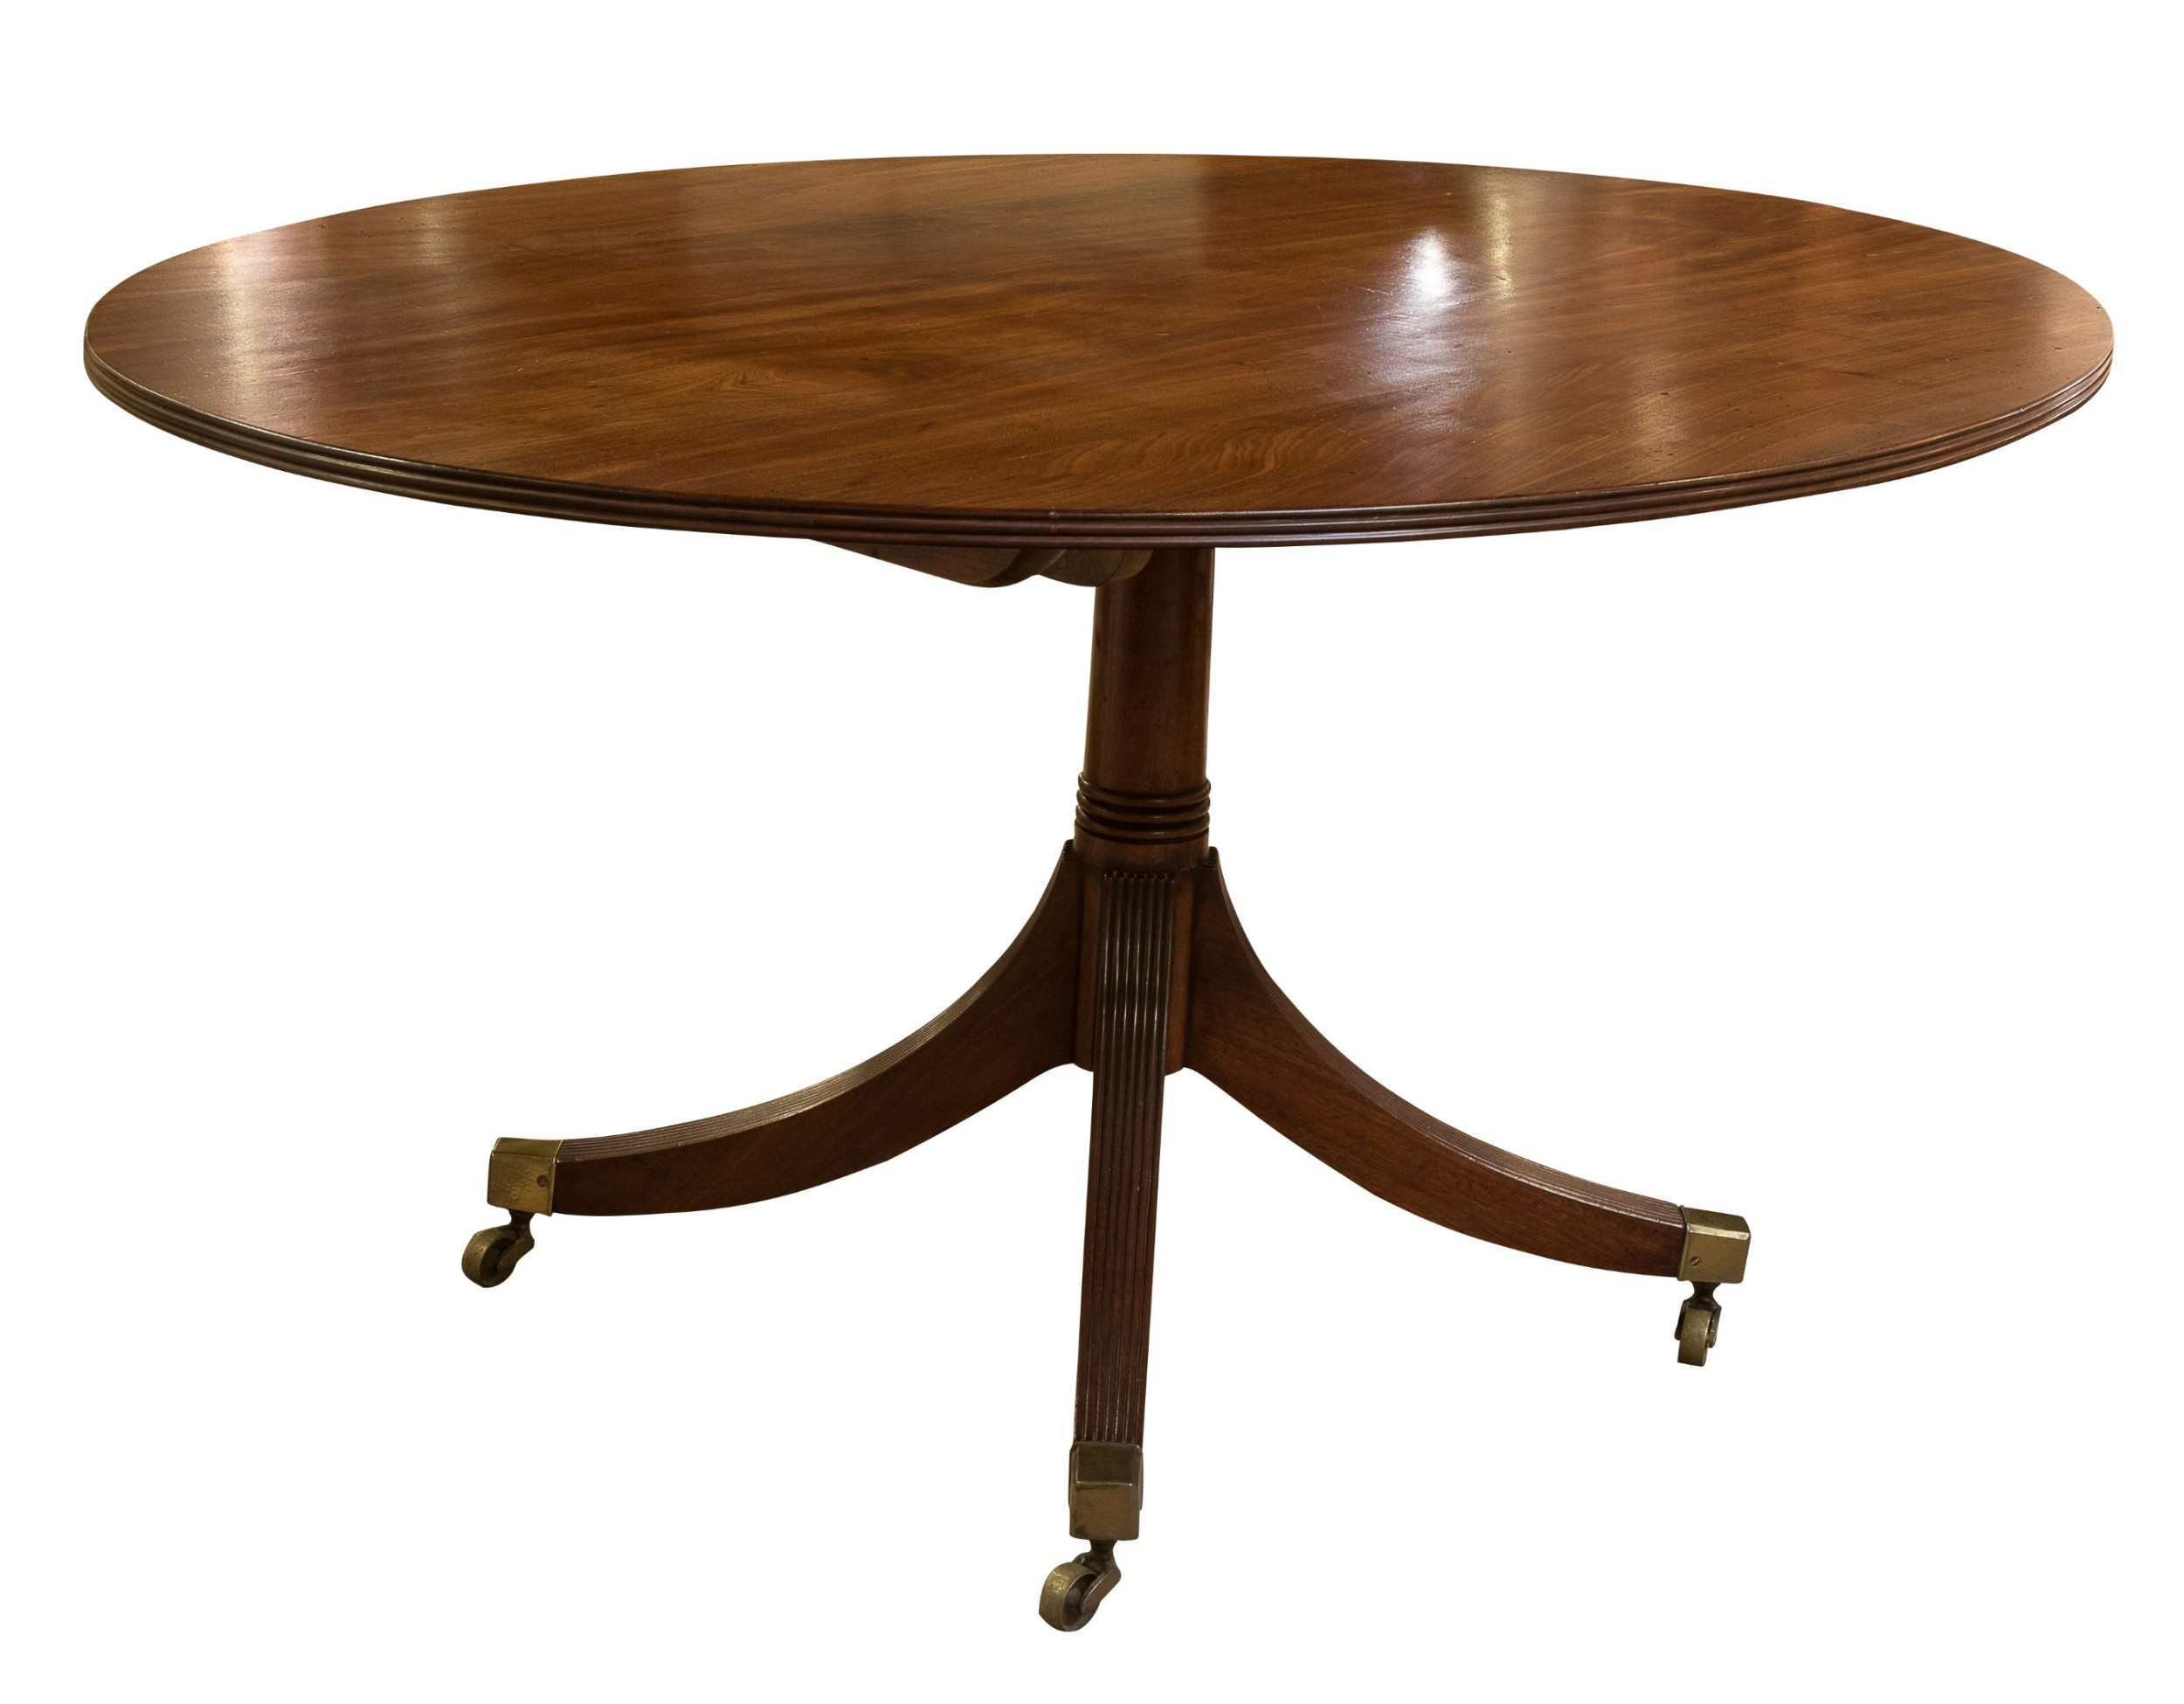 regency mahogany oval breakfast table on turned pillar legs c1820